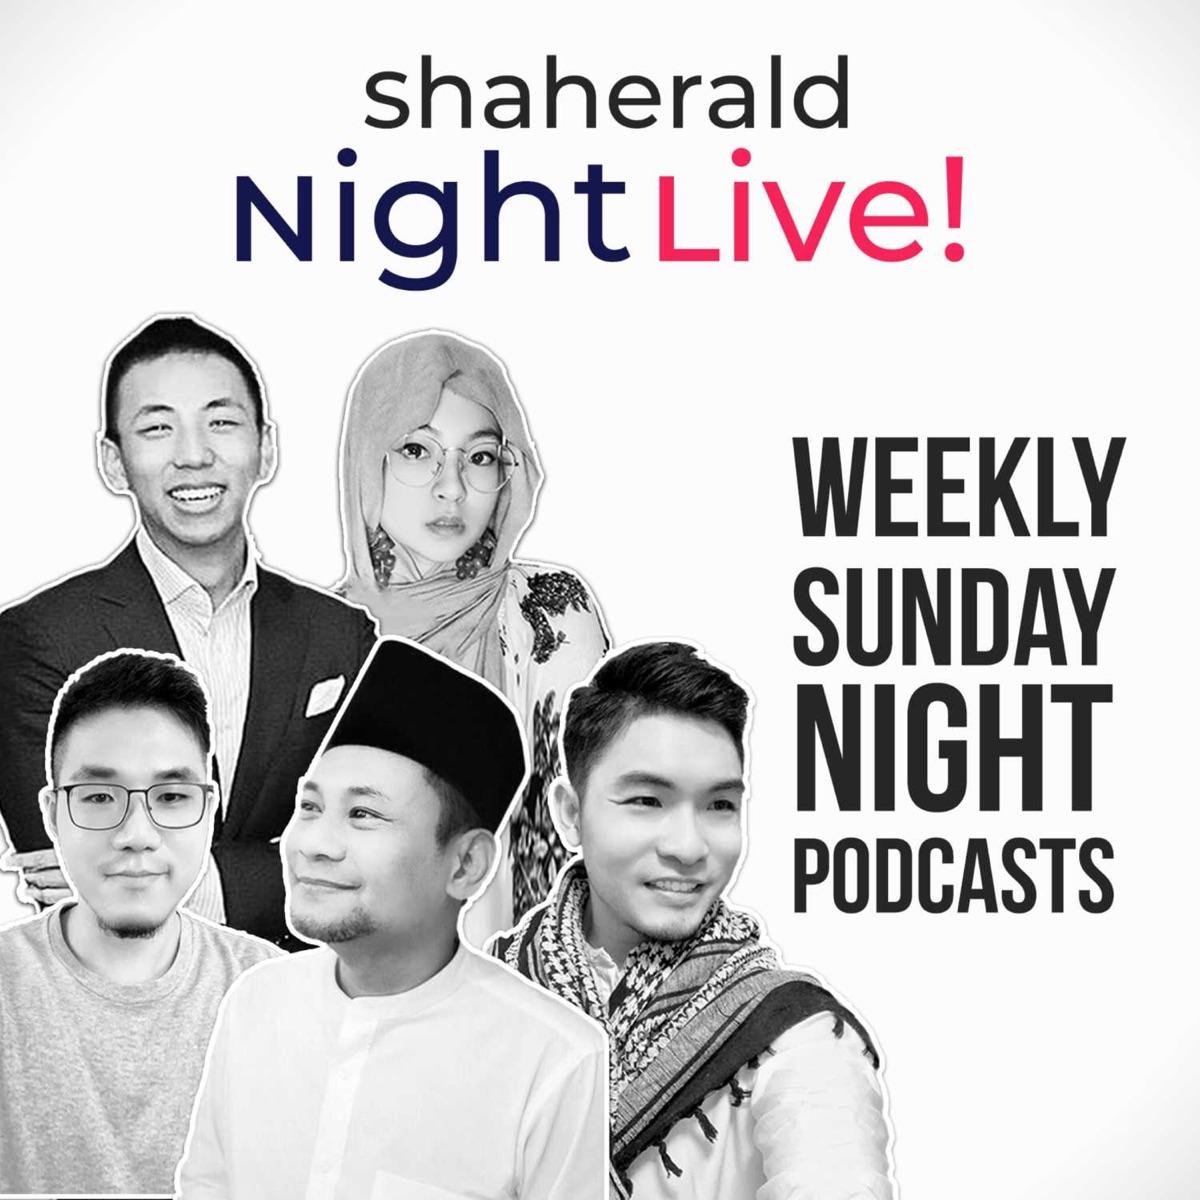 Shaherald Night Live!